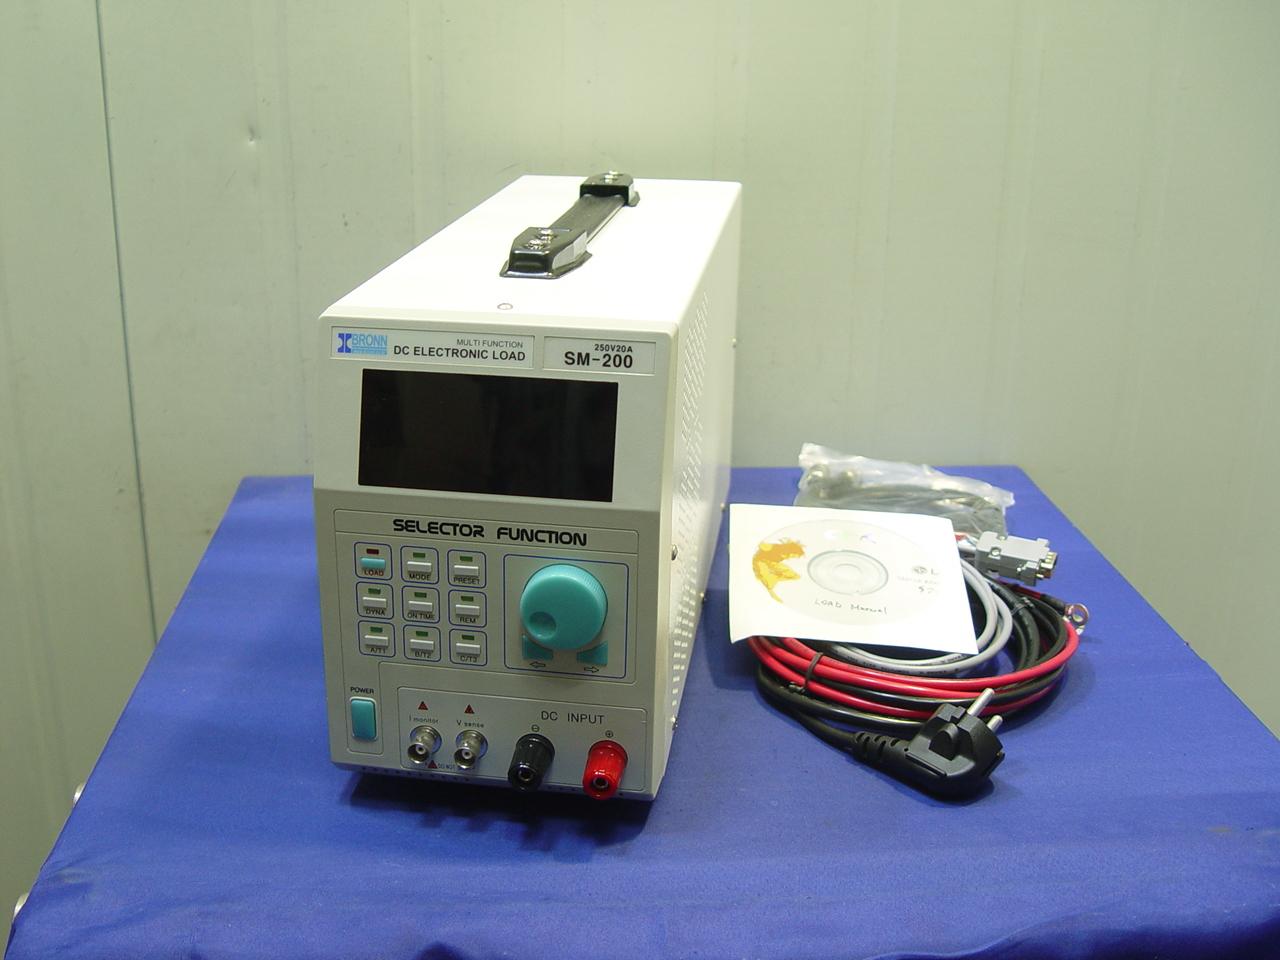 [B1869] 전자로드 SM-200 250V 20A 200W LOAD